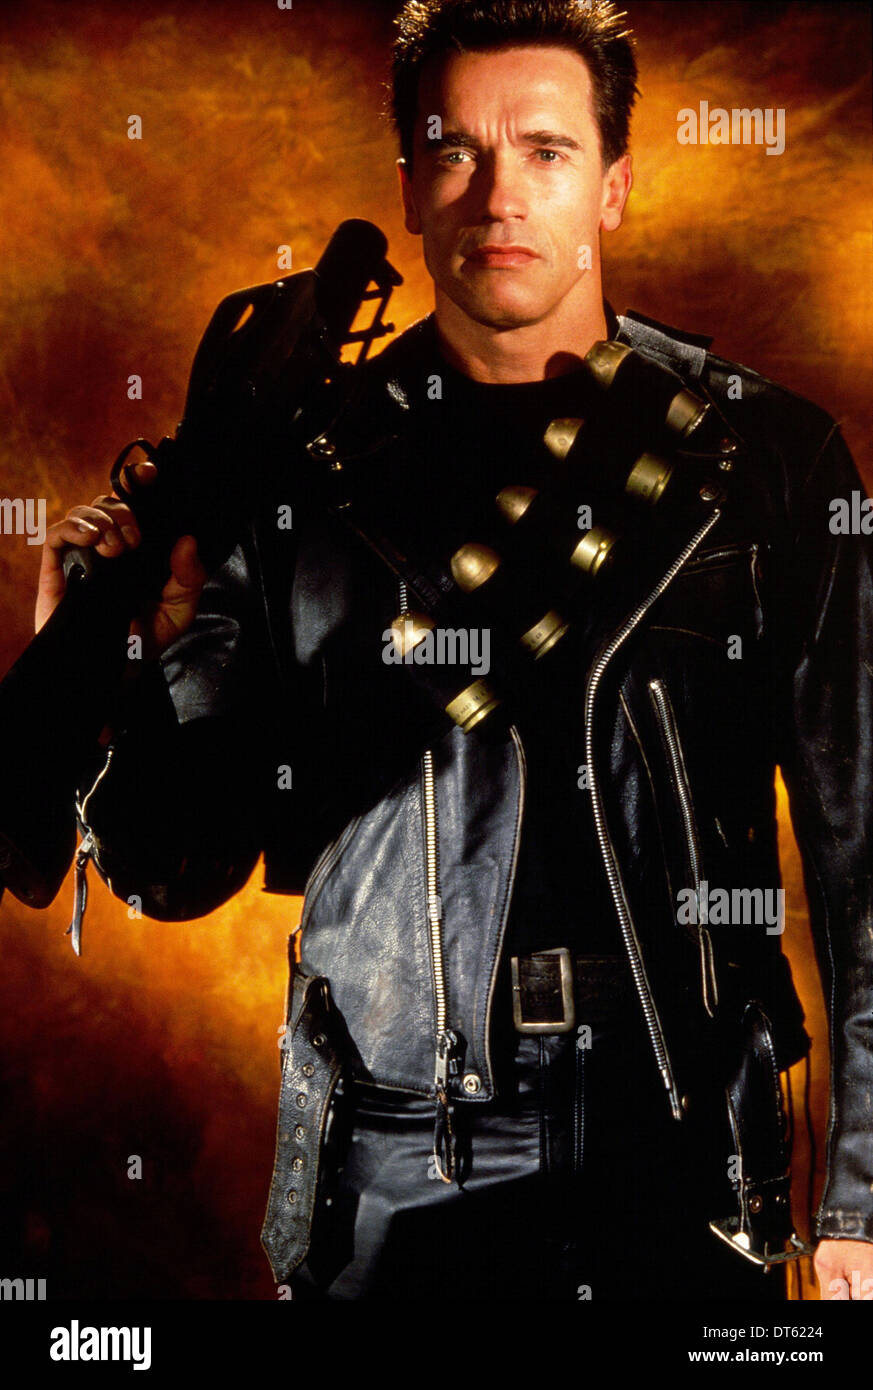 Arnold Schwarzenegger Terminator 2 Judgment Day 1991 Stock Photo Alamy